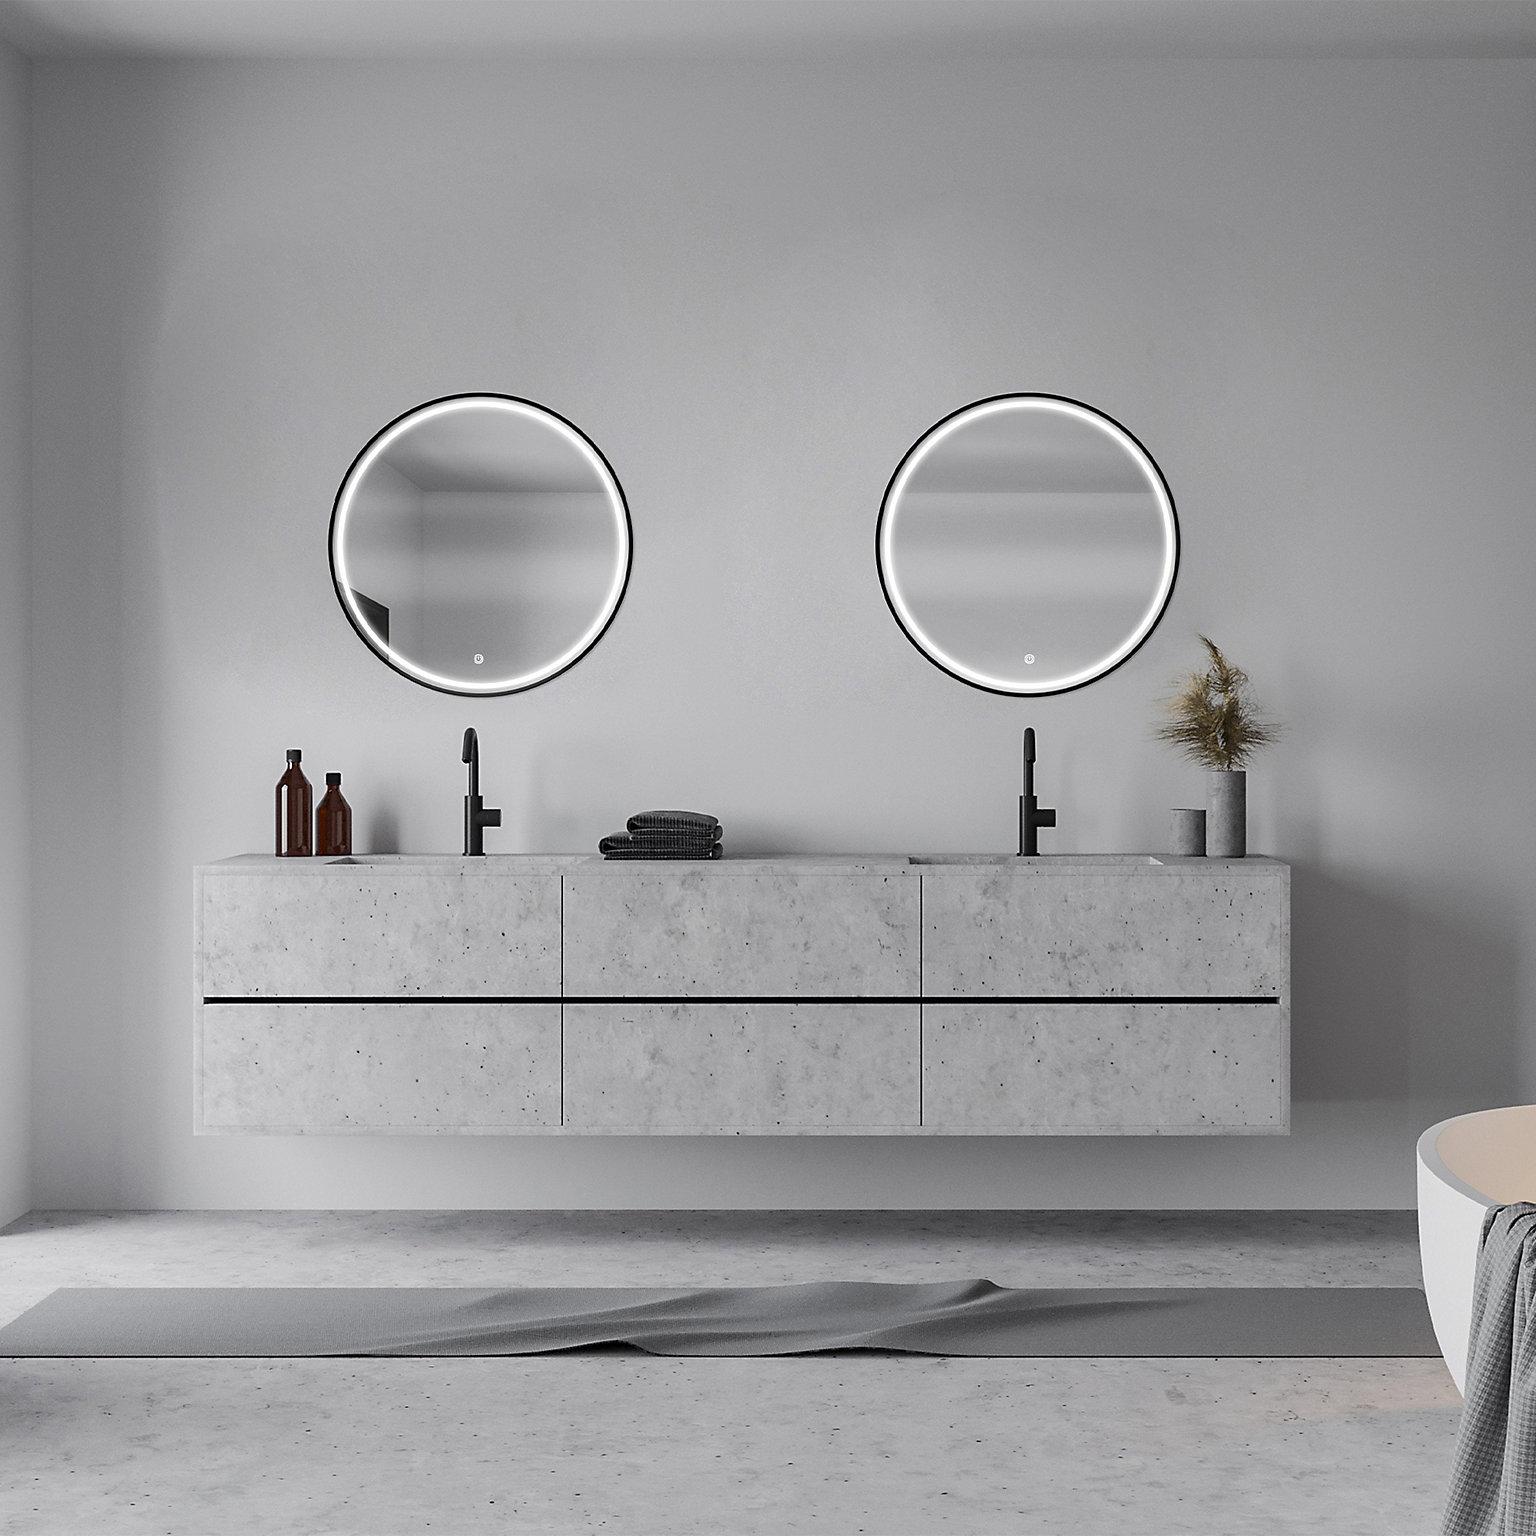 Trend Miroir Salle De Bain Lumineux Castorama